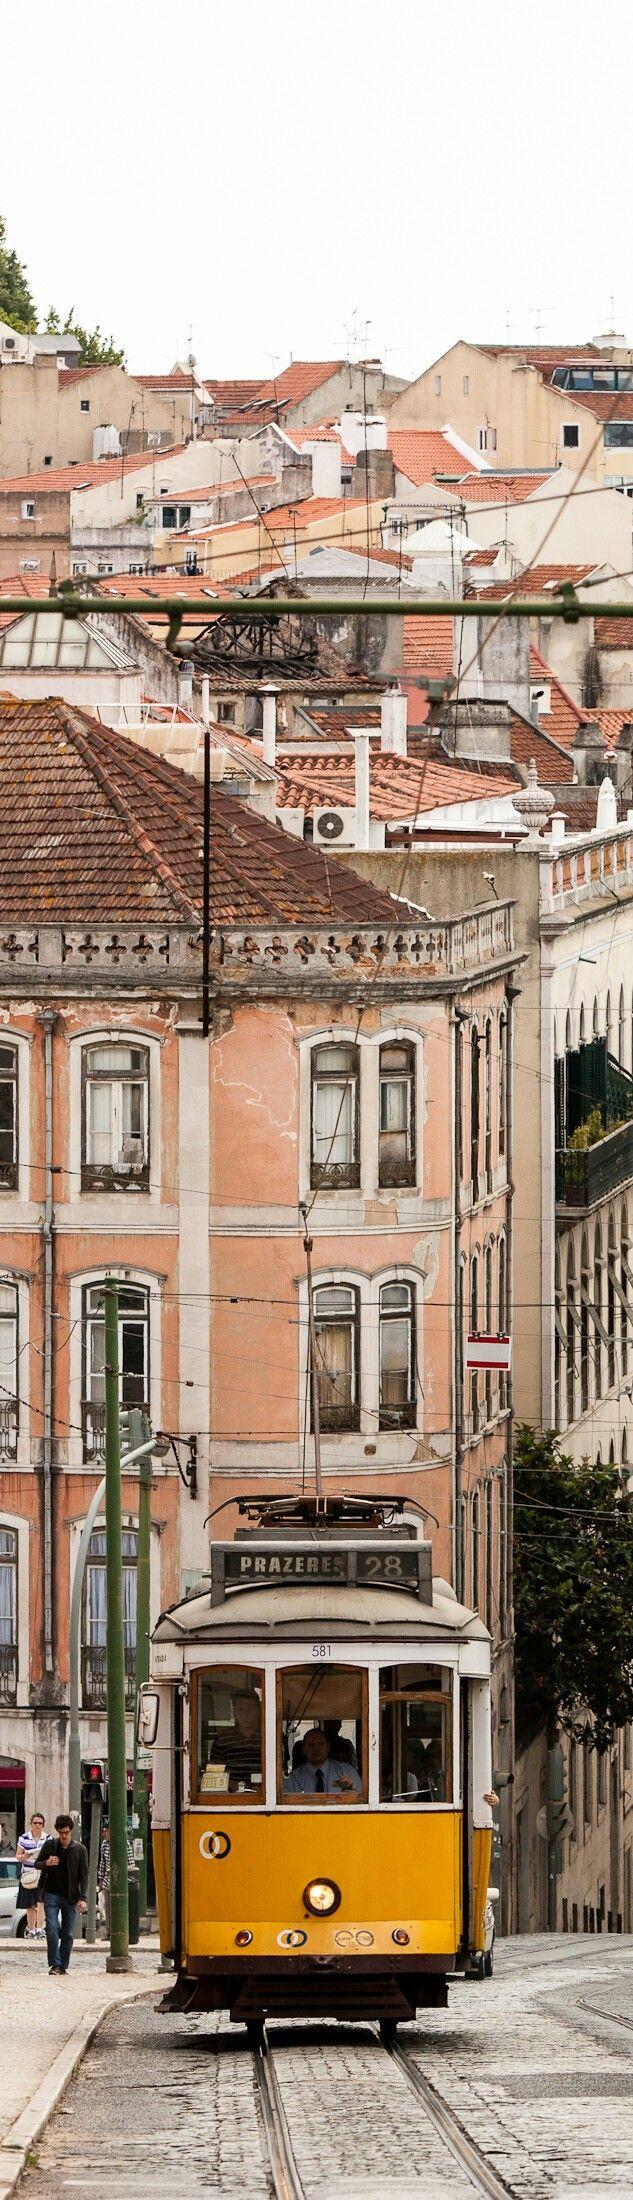 Lisbona, Portogallo.